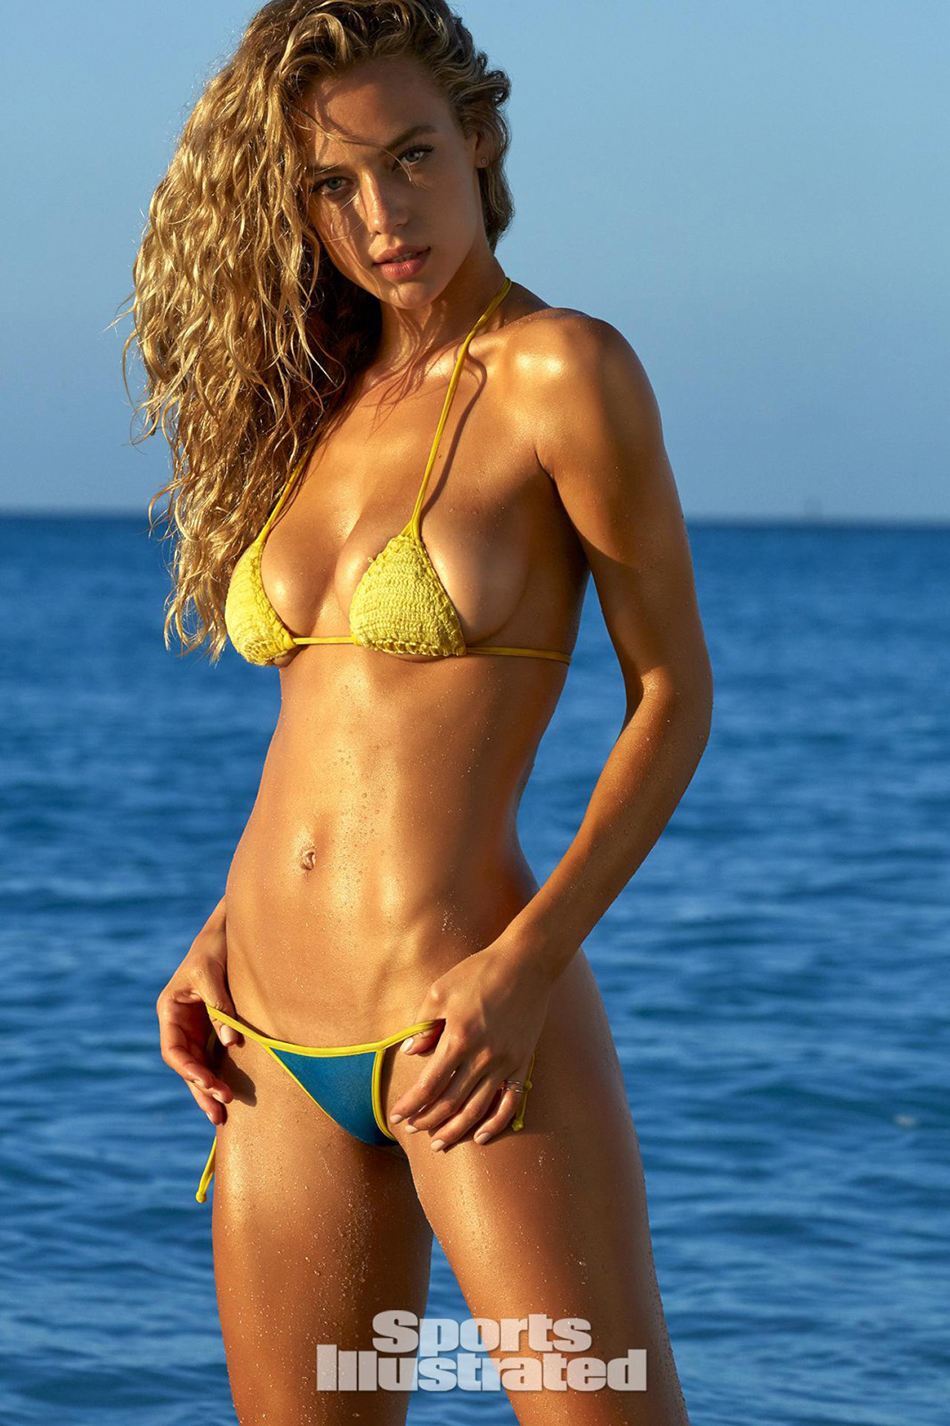 Swimsuit hannah illustrated nude models sports ferguson